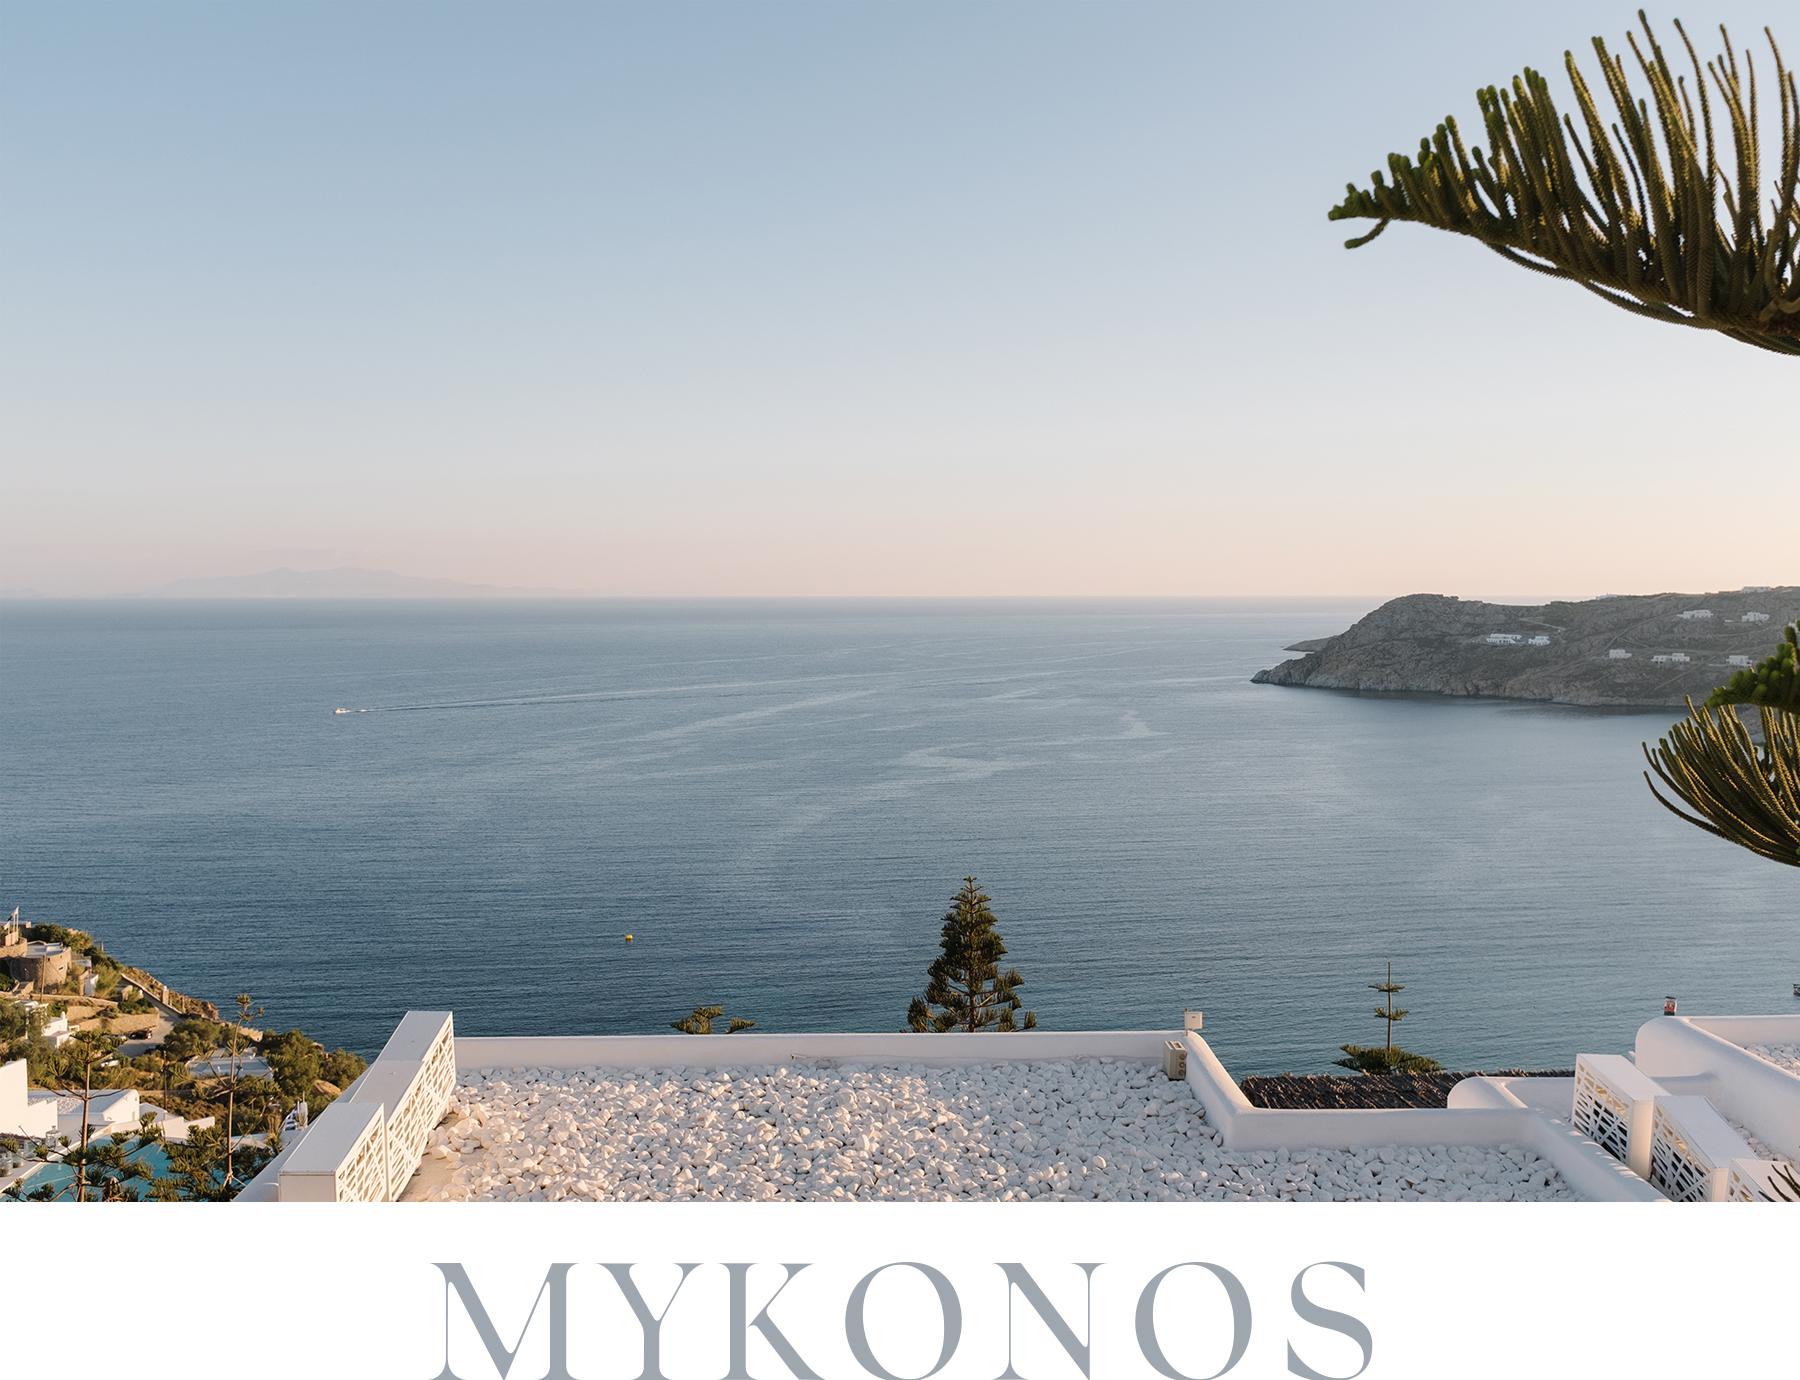 Mykonos_Guide_Carin_Olsson.jpg